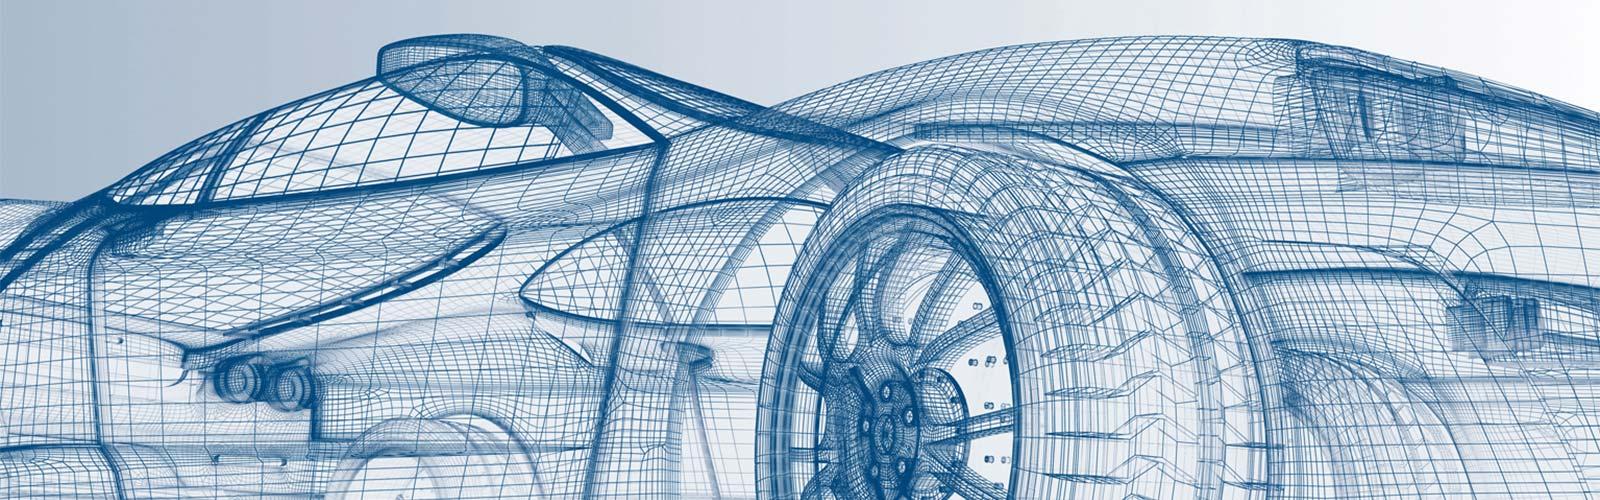 Imagebild-Engineering.jpg